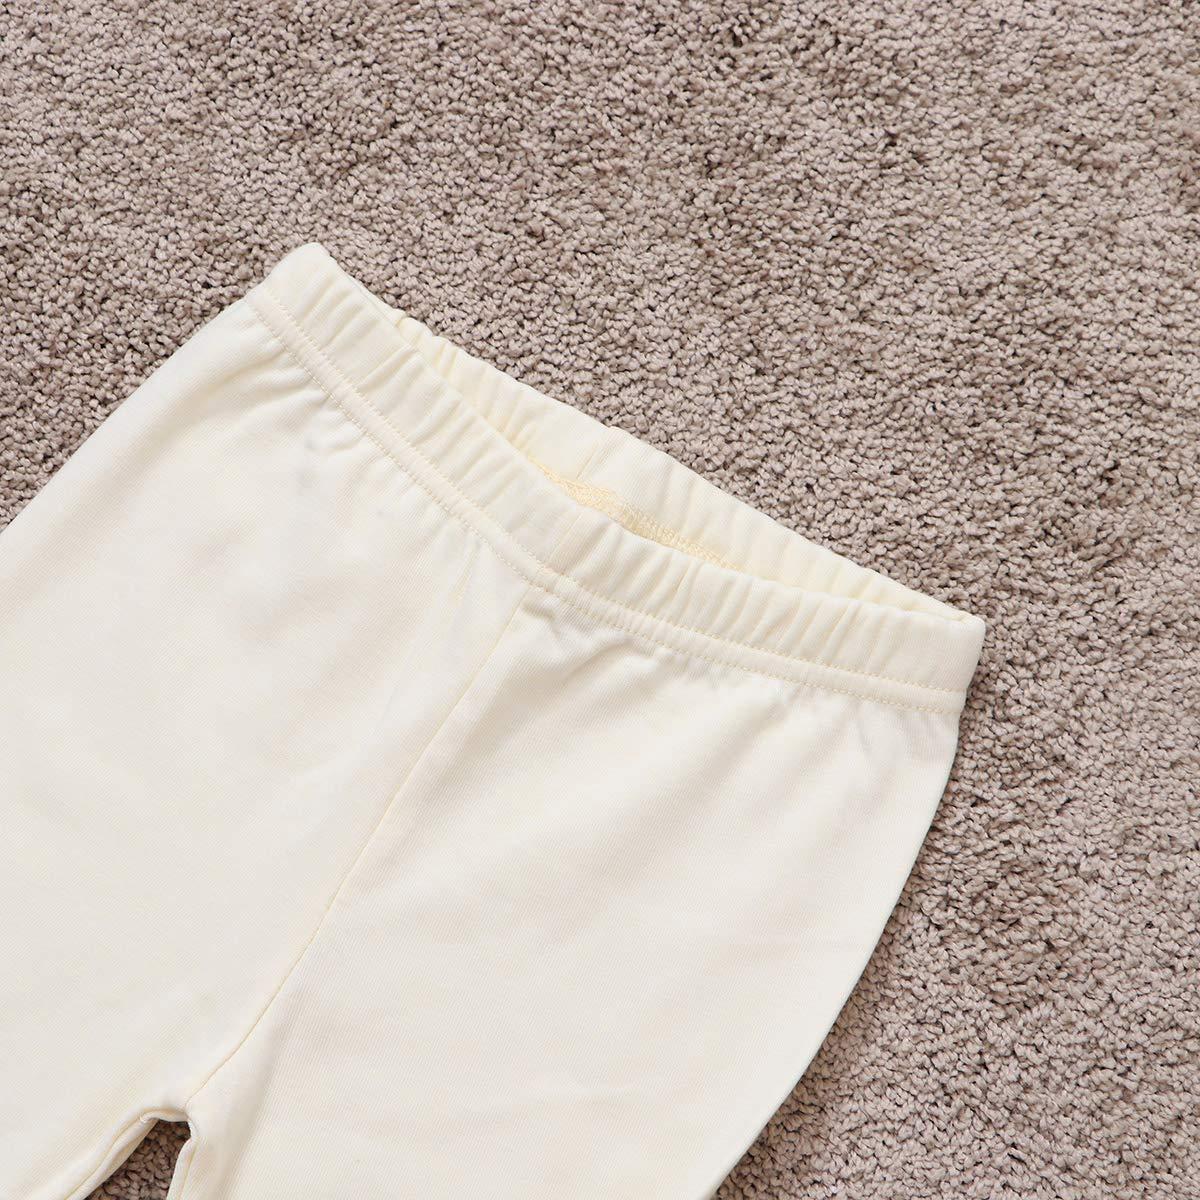 Girls Cotton Leggings Stretchy Soft Spring Fall Leggings Pants Size 120cm Beige